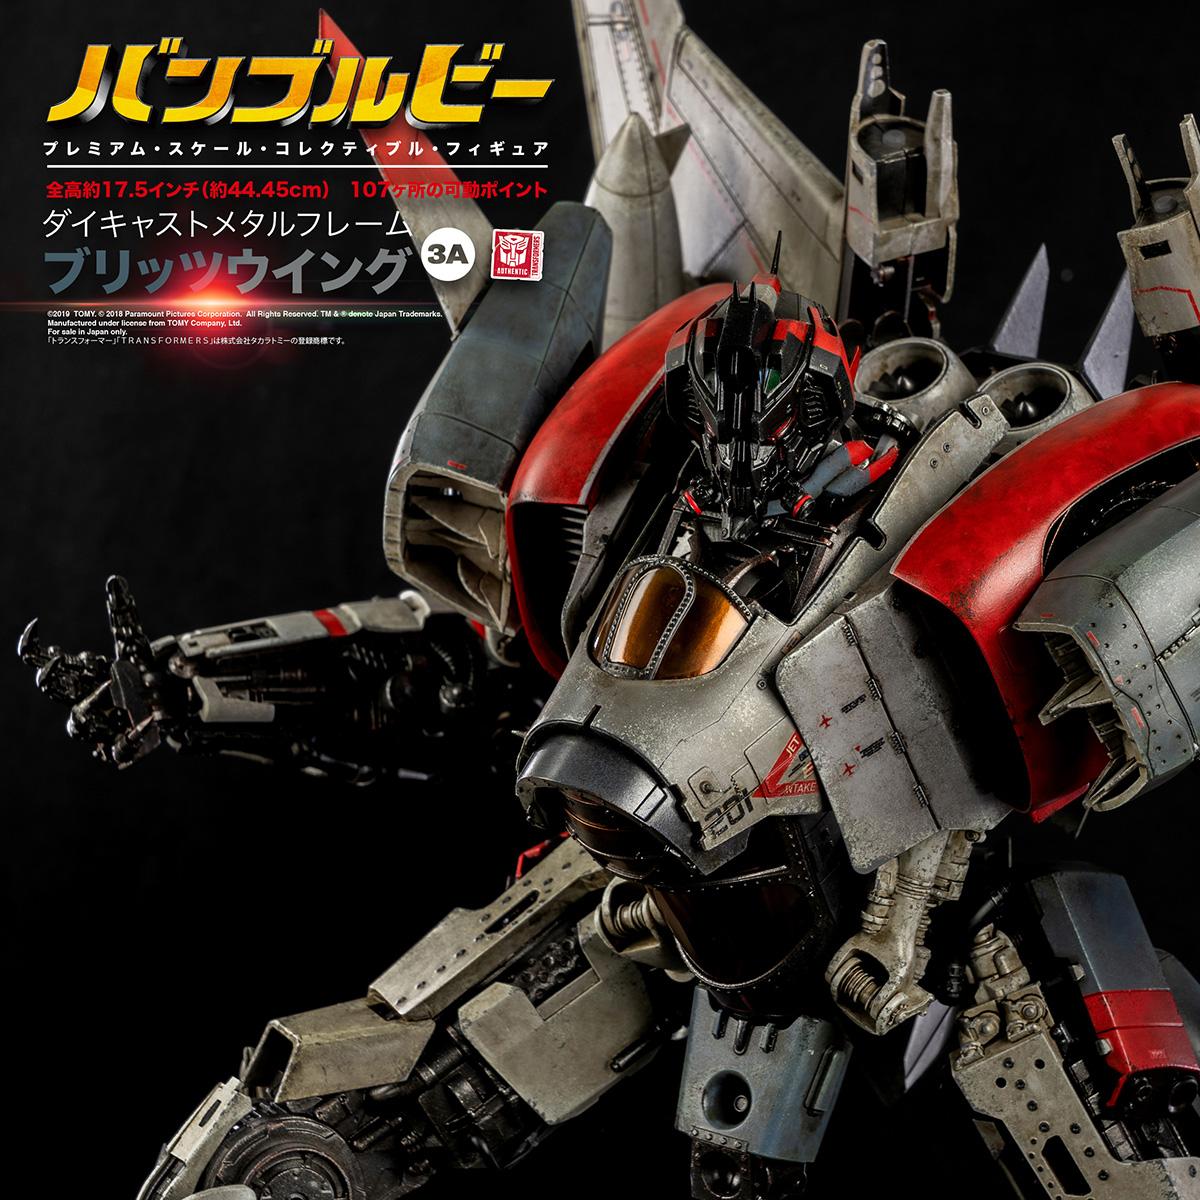 Blitzwing_PM_JAP_1075(Teaser).jpg